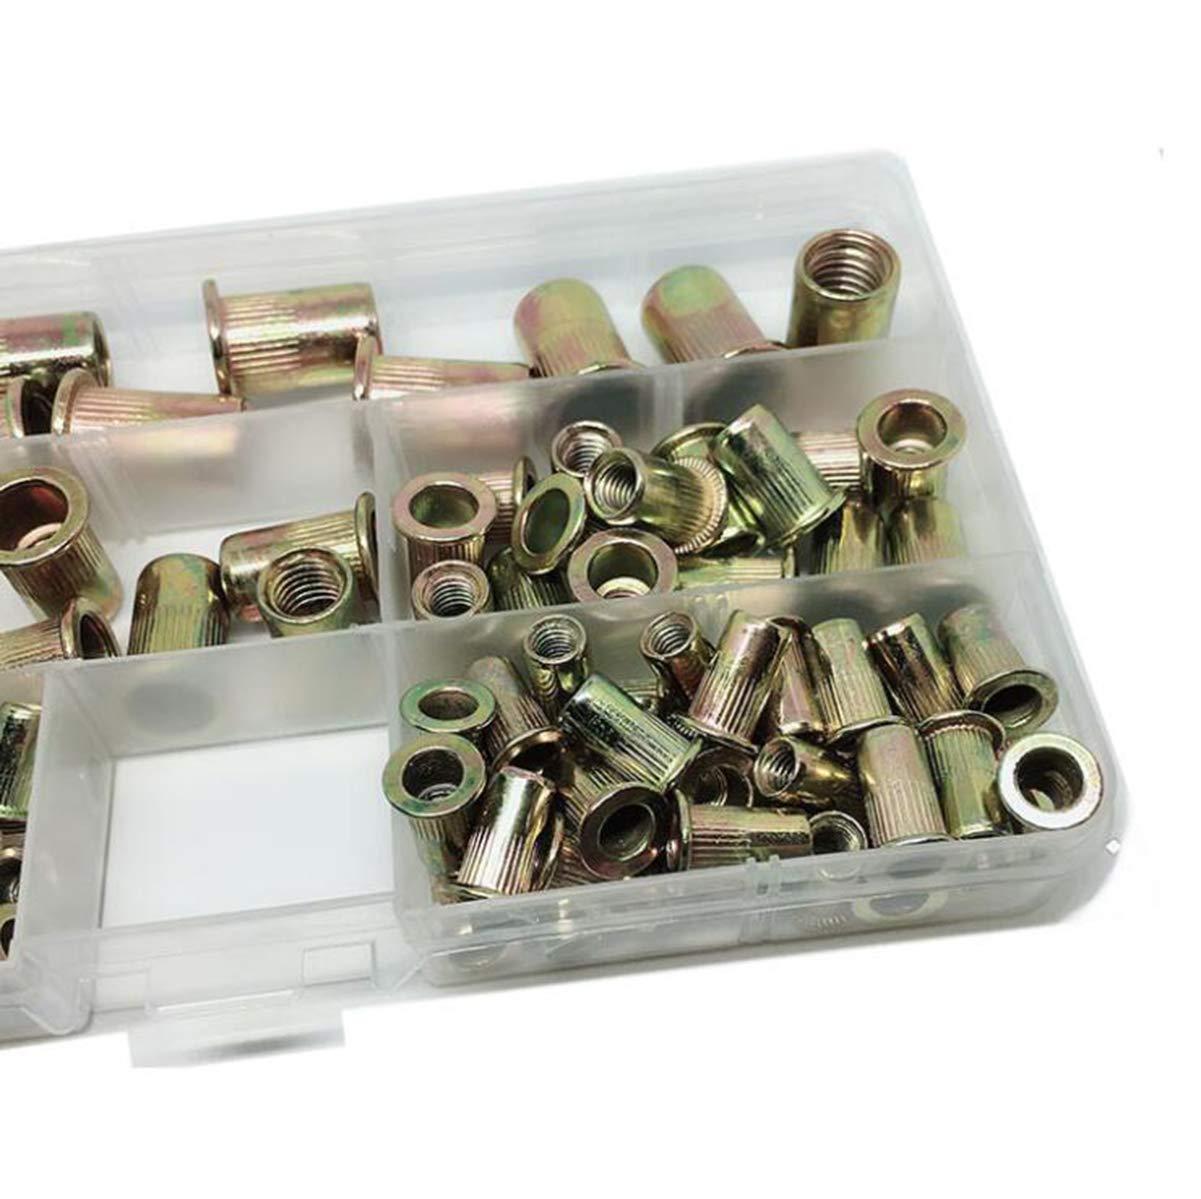 Fiyuer 200 Piezas Remaches Tuerca Threaded Insert Inox Roscado Acero Inoxidable Nutsert Rivet Nut,Por Embotamiento Surtido Kit M3,M4,M5,M6,M8,M10 Packaged by Plastic Case